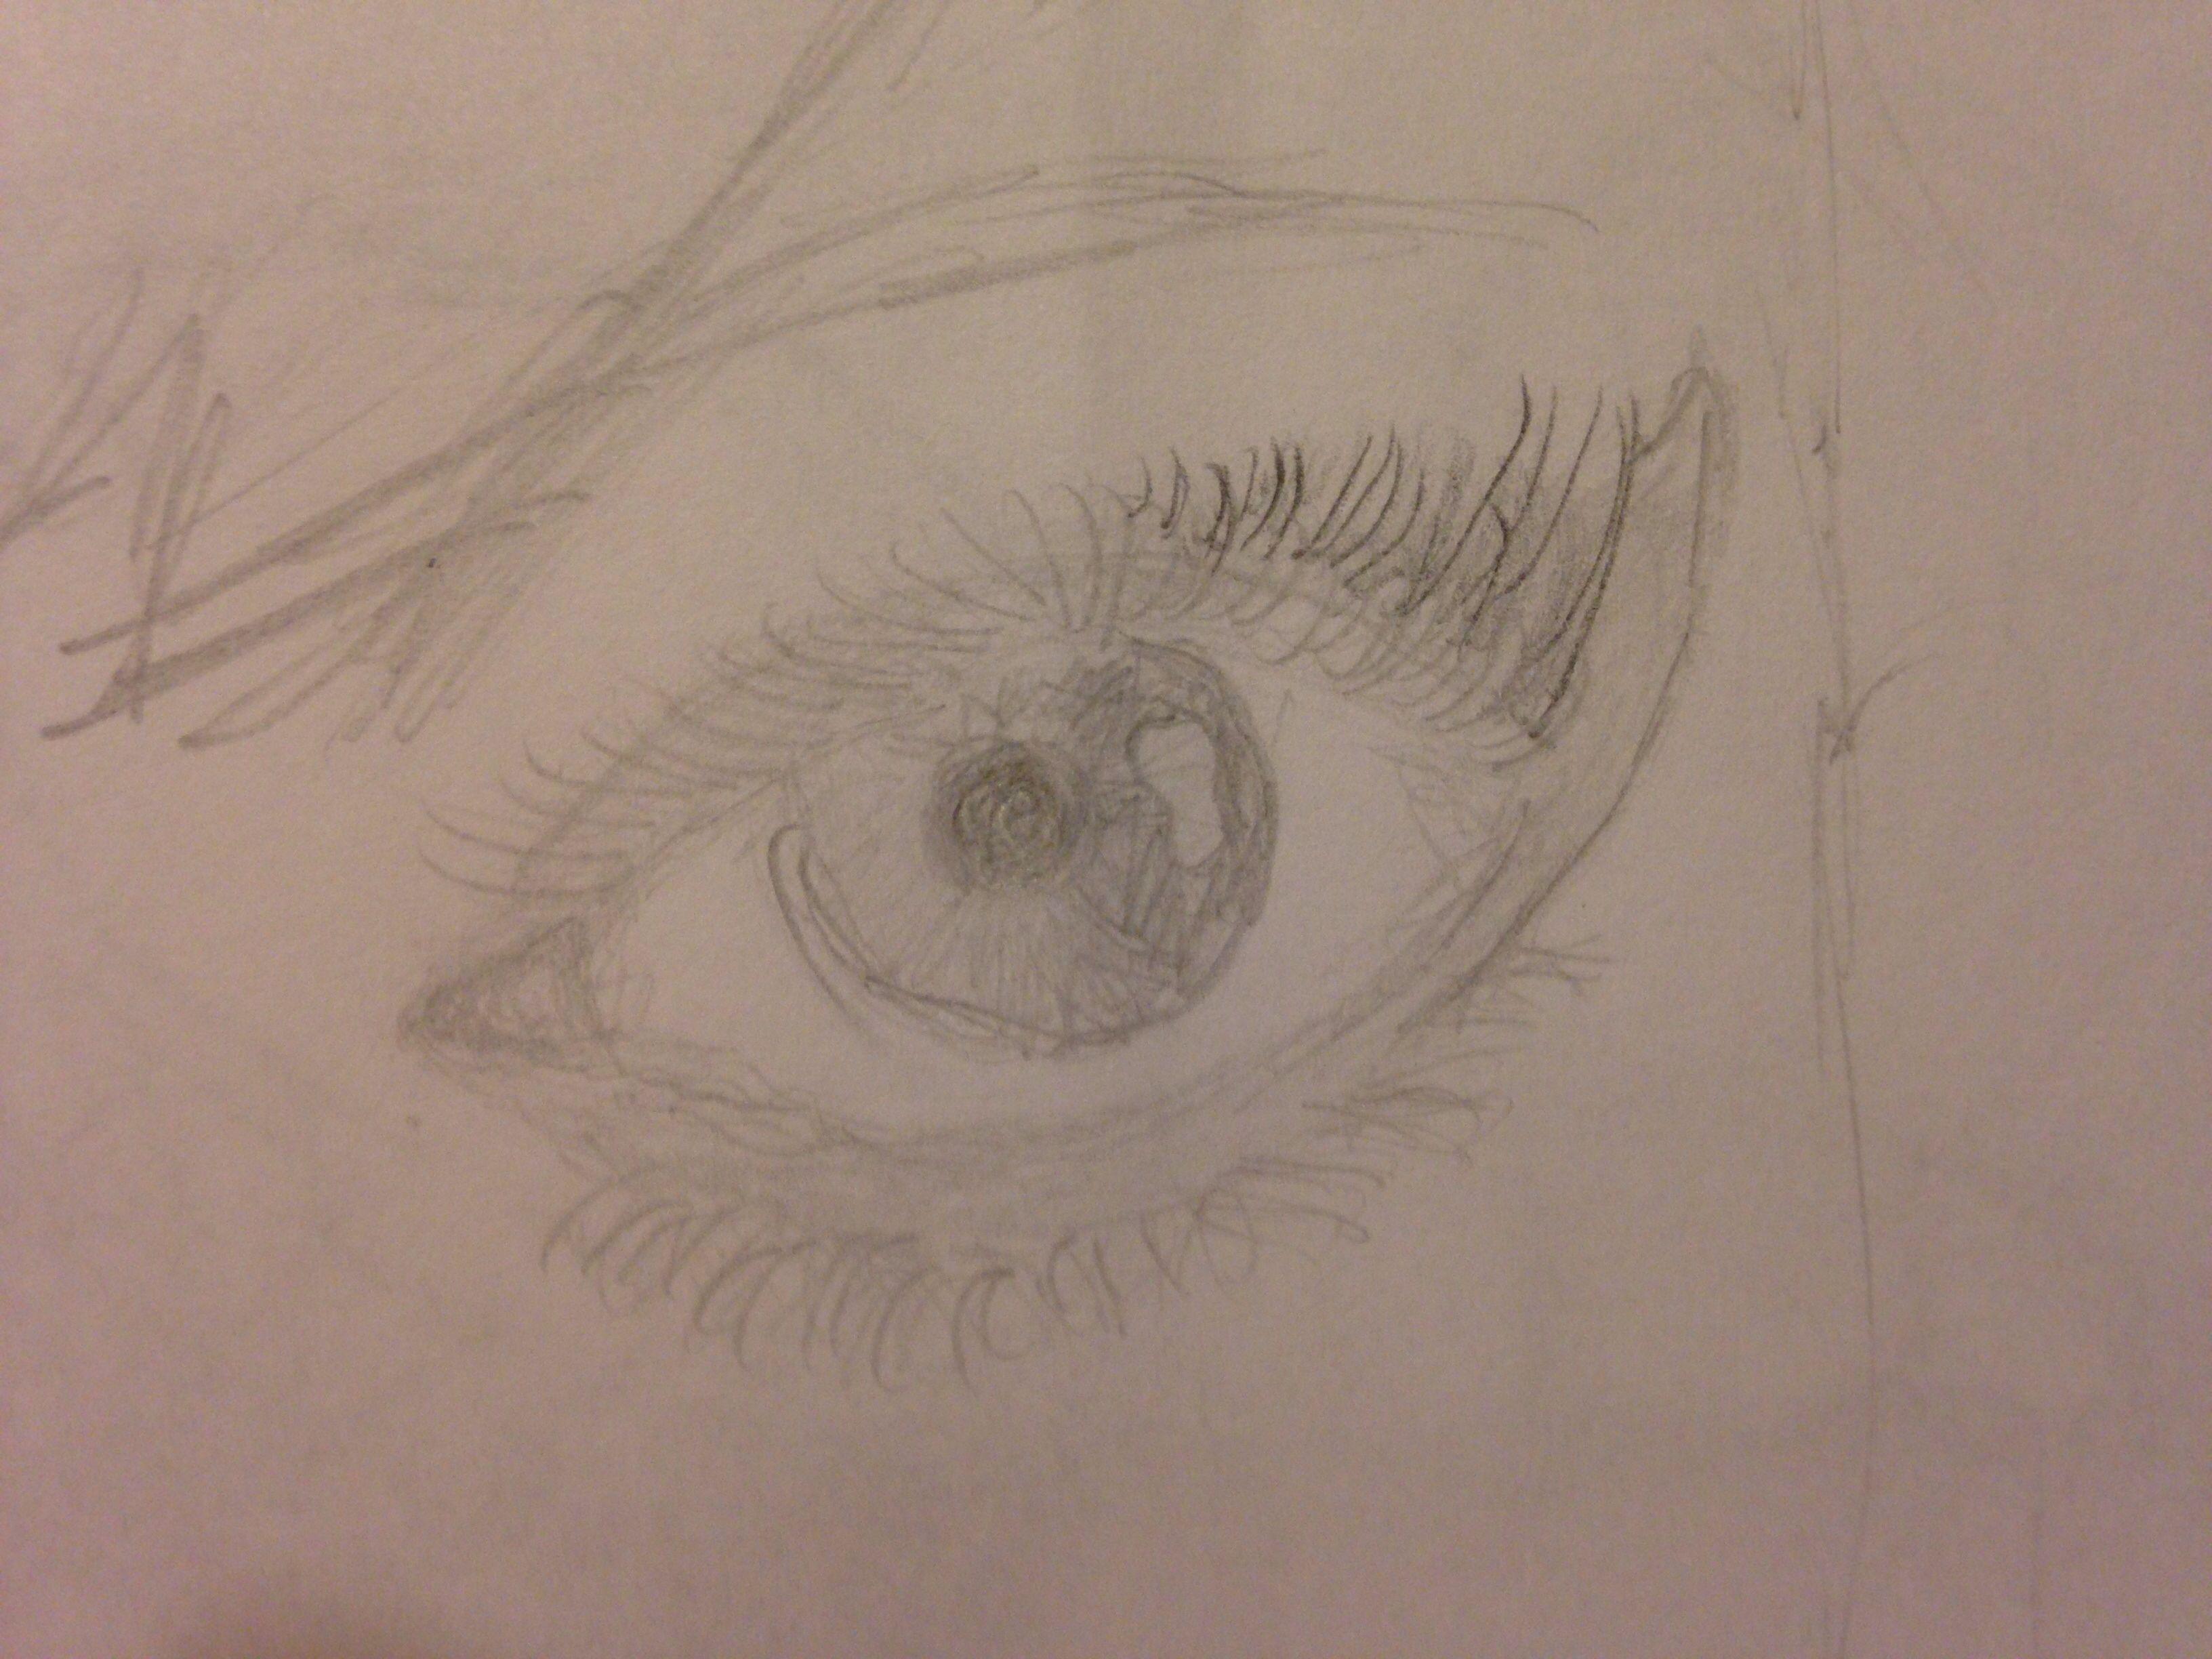 3264x2448 Left Eye Drawing By Me! Art